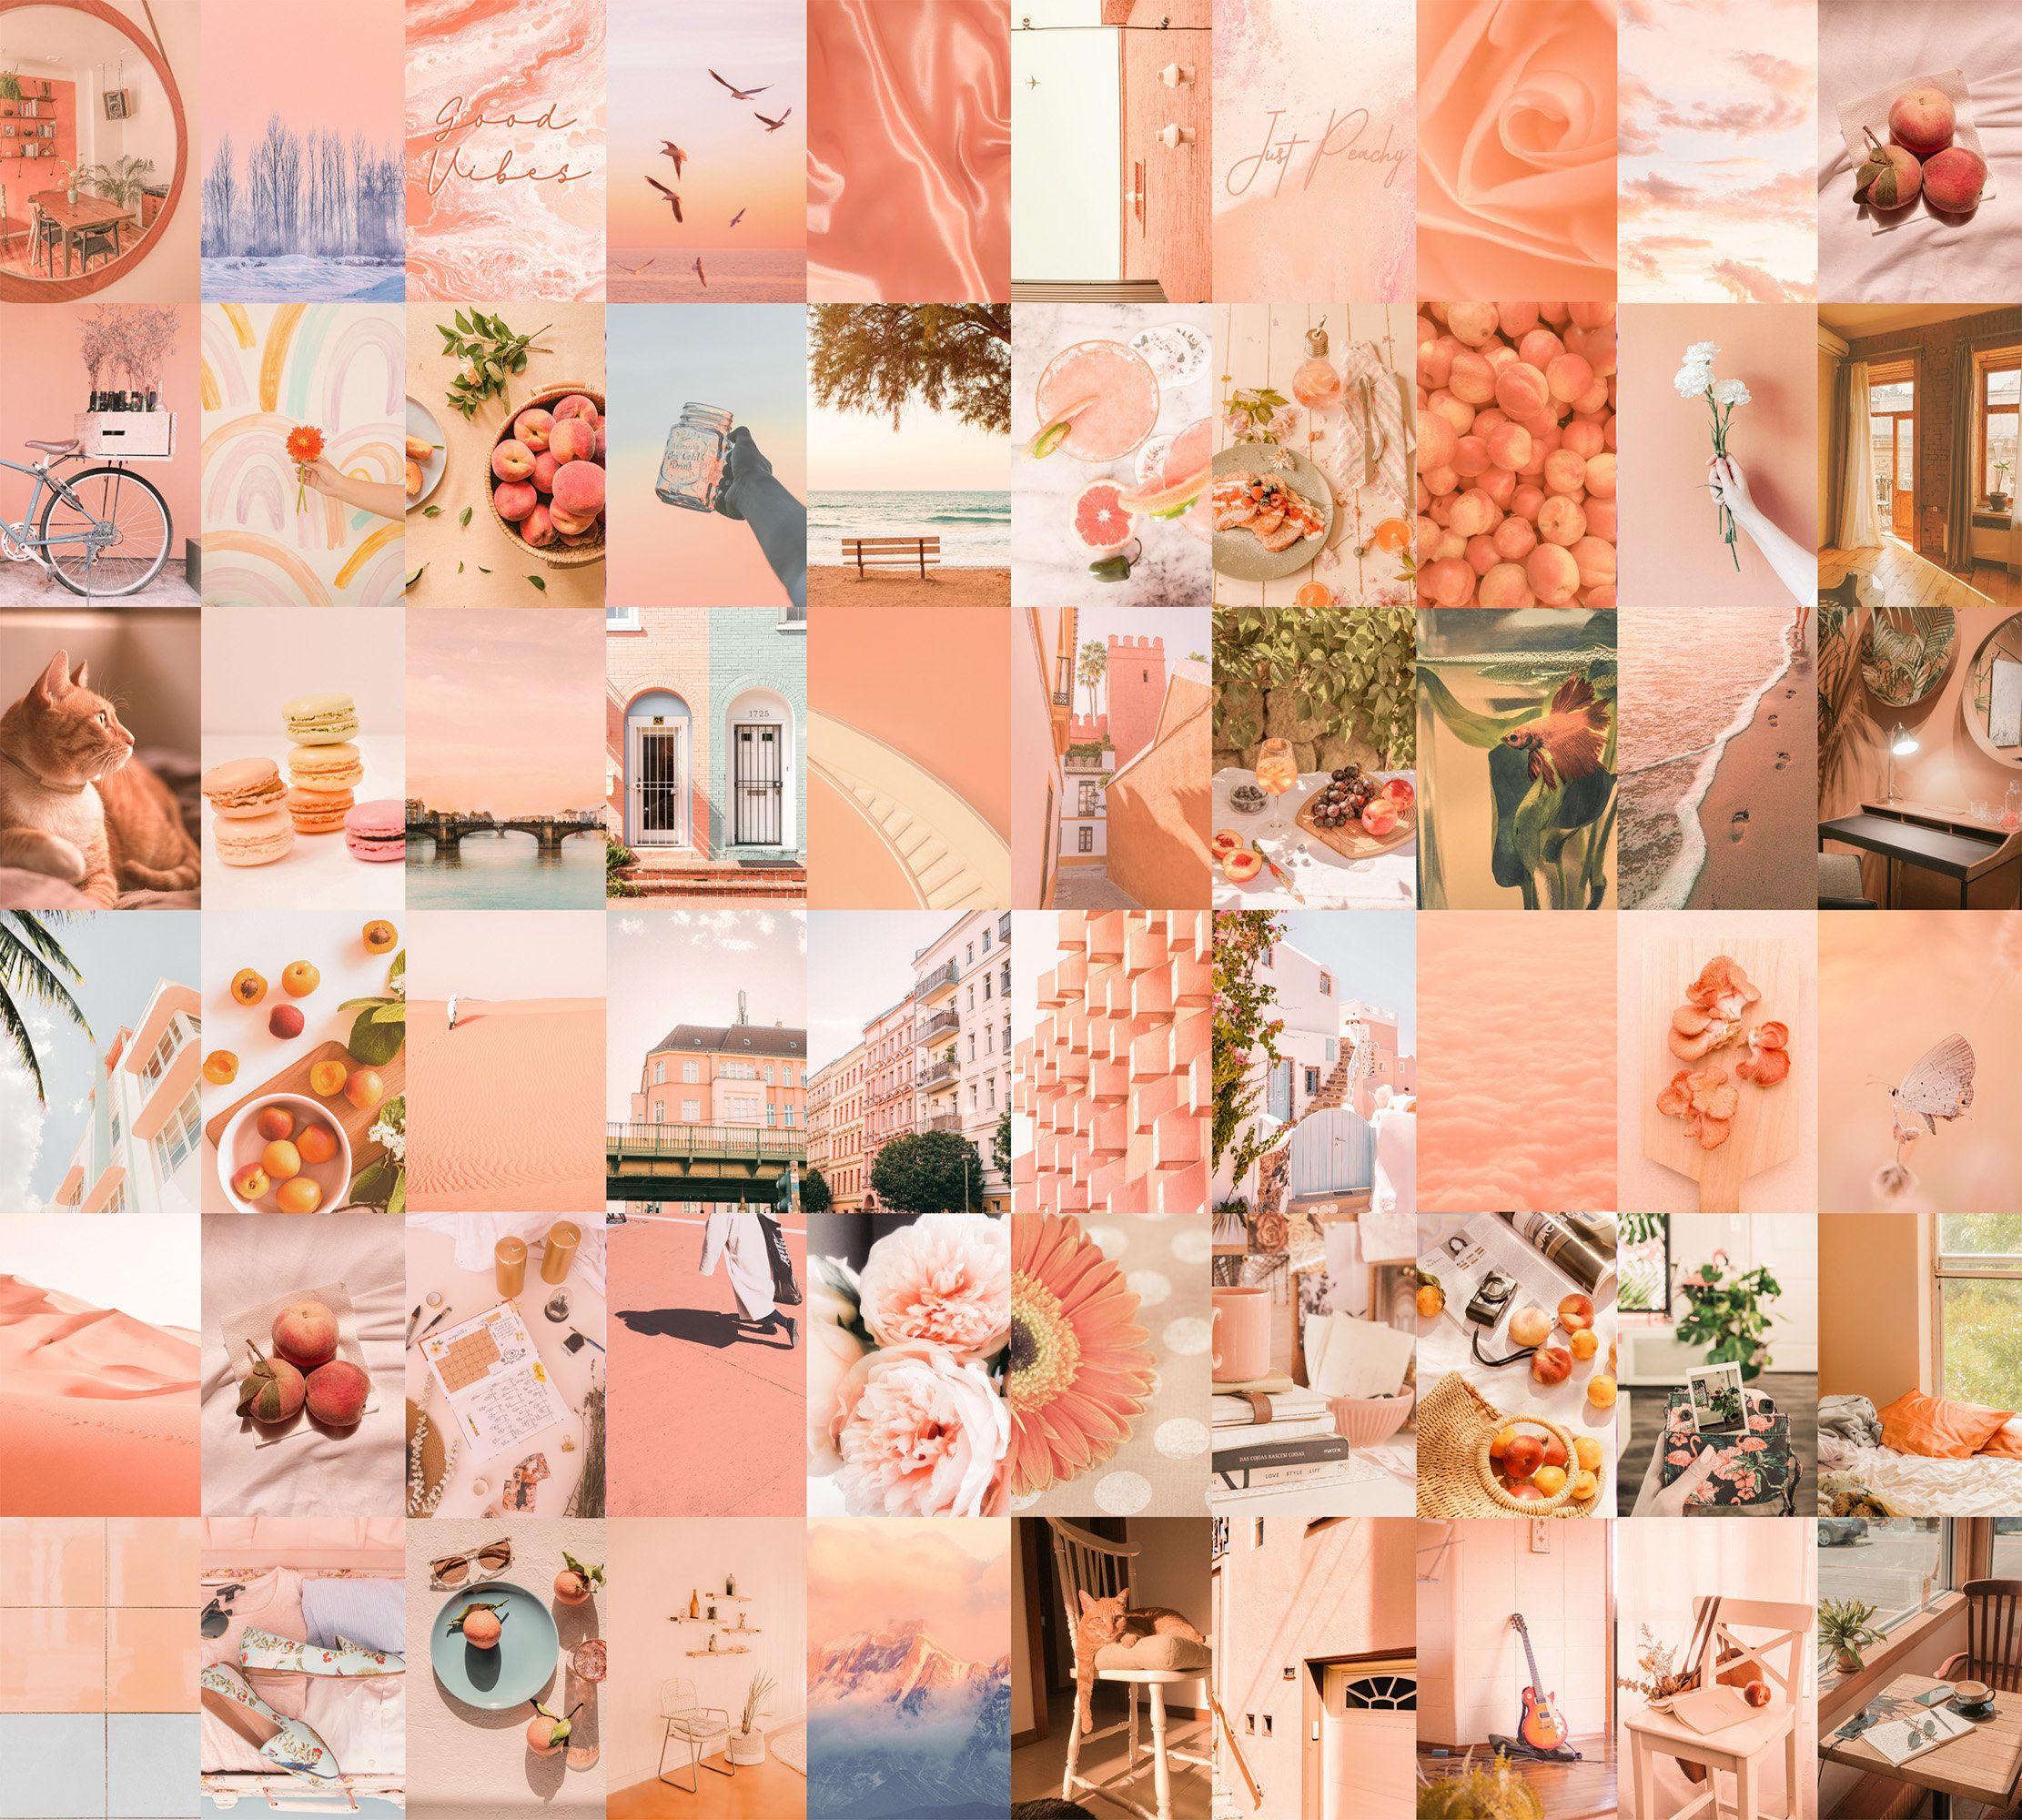 Wall Collage Kit Aesthetic Peachy 60pcs Digital Photo Wallpaper Download Pastel Peach Vision Mood Board Set Printable Art Room Decor Wall Collage Photo Wallpaper Print Collage Download aesthetic room colors